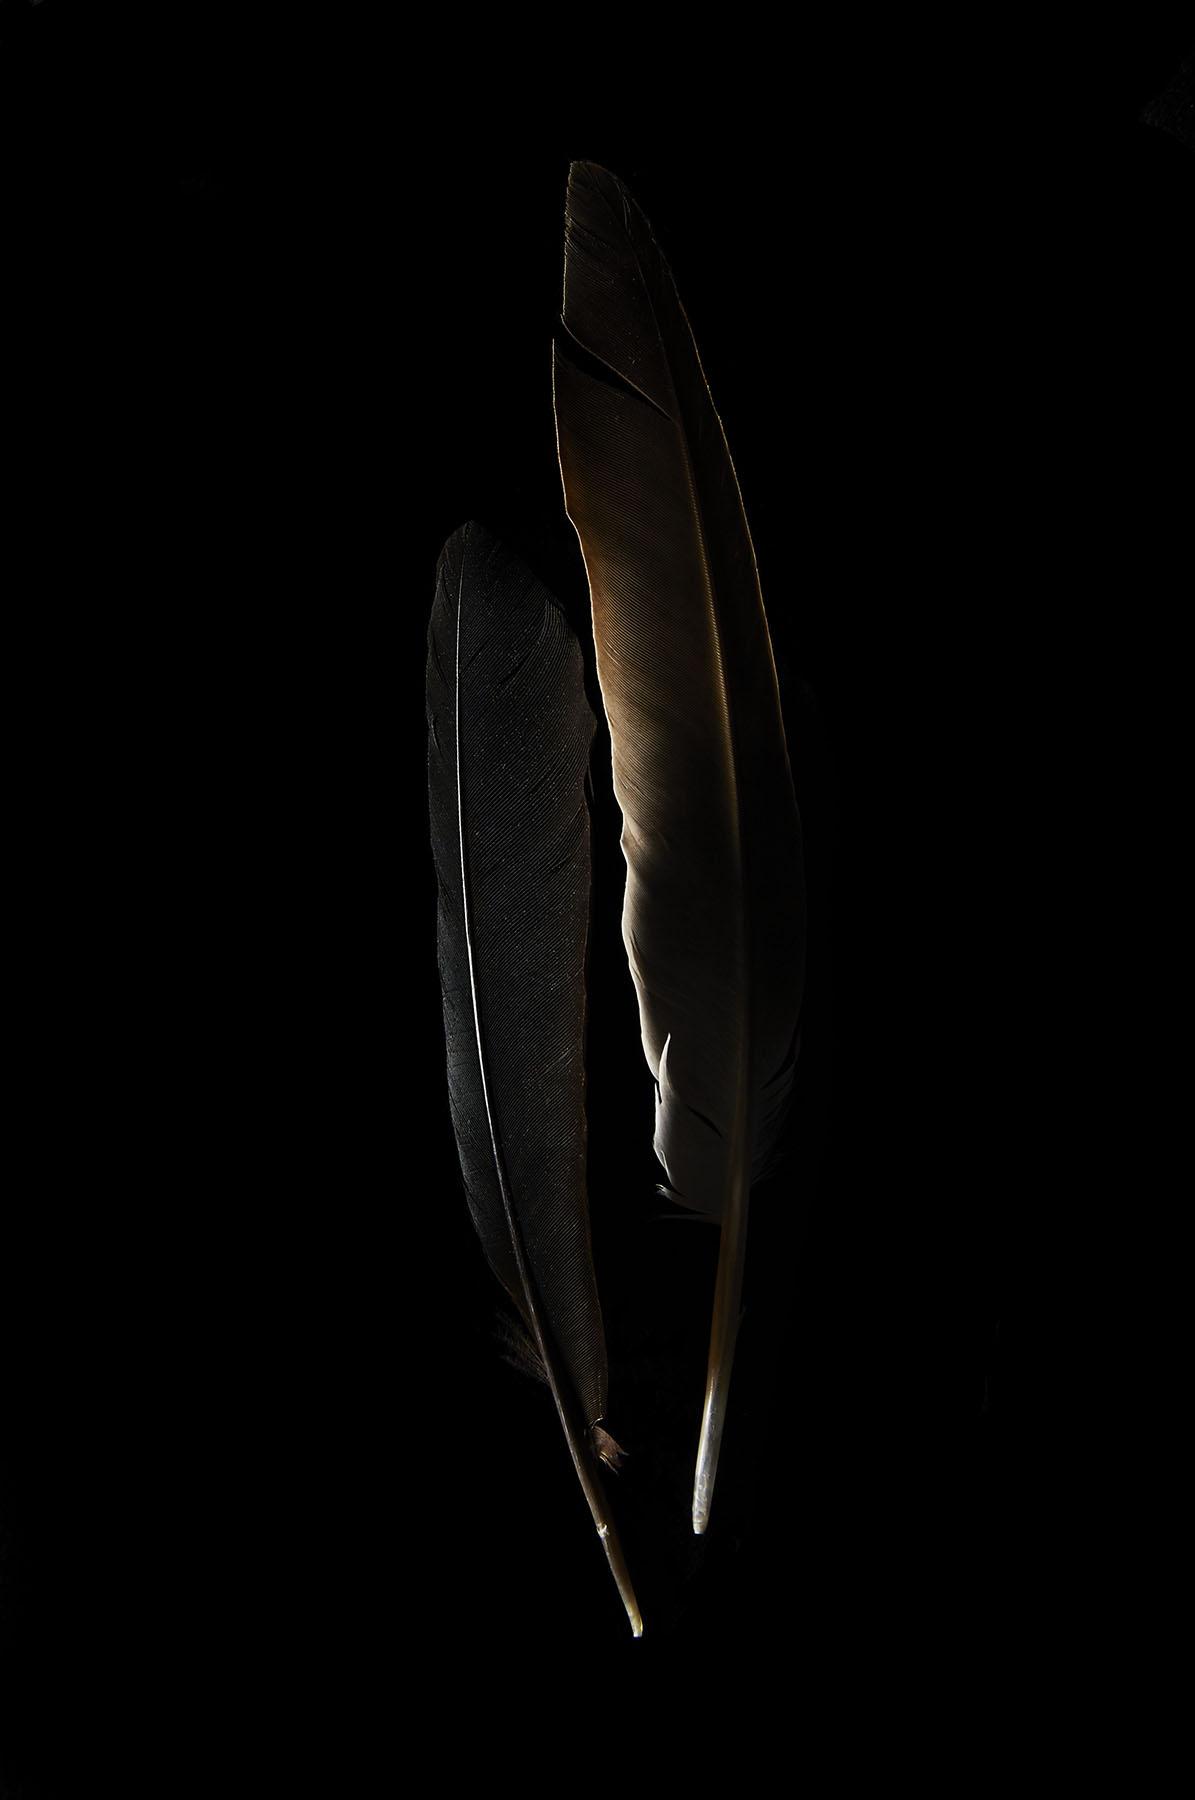 feather37543.jpg